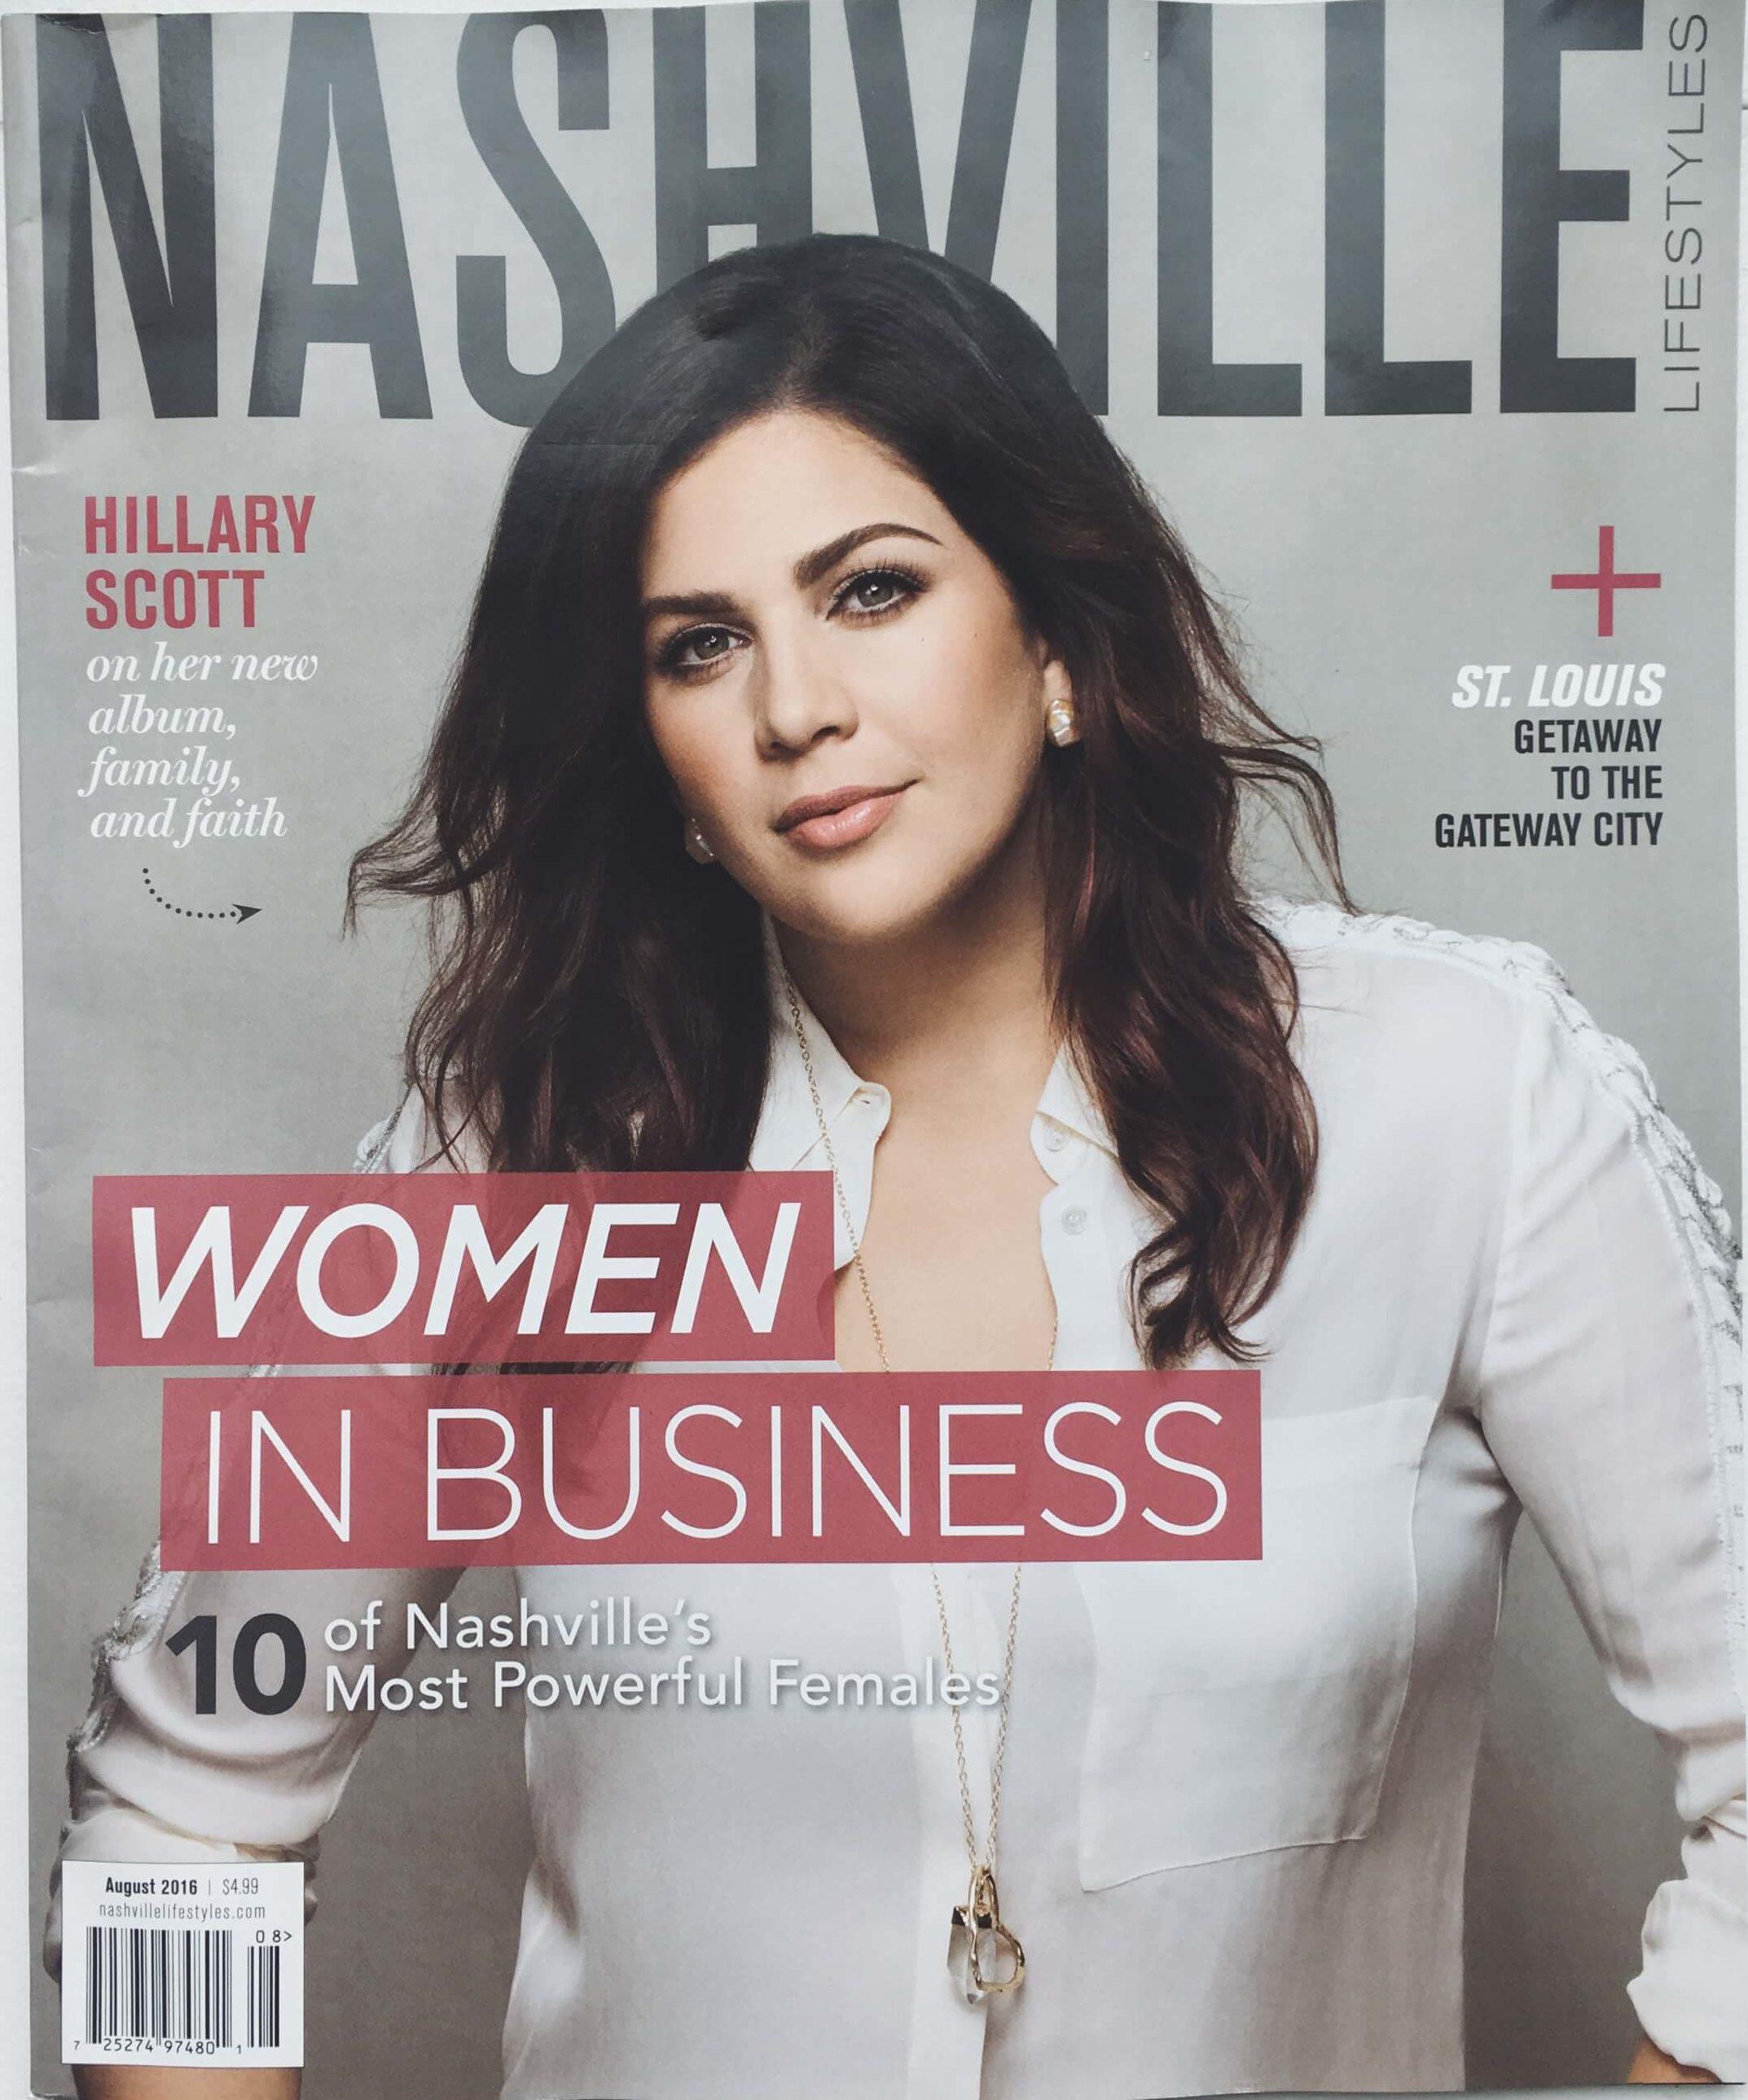 Nashville Lifestyles Magazine: 10 of Nashville's Most Powerful Females